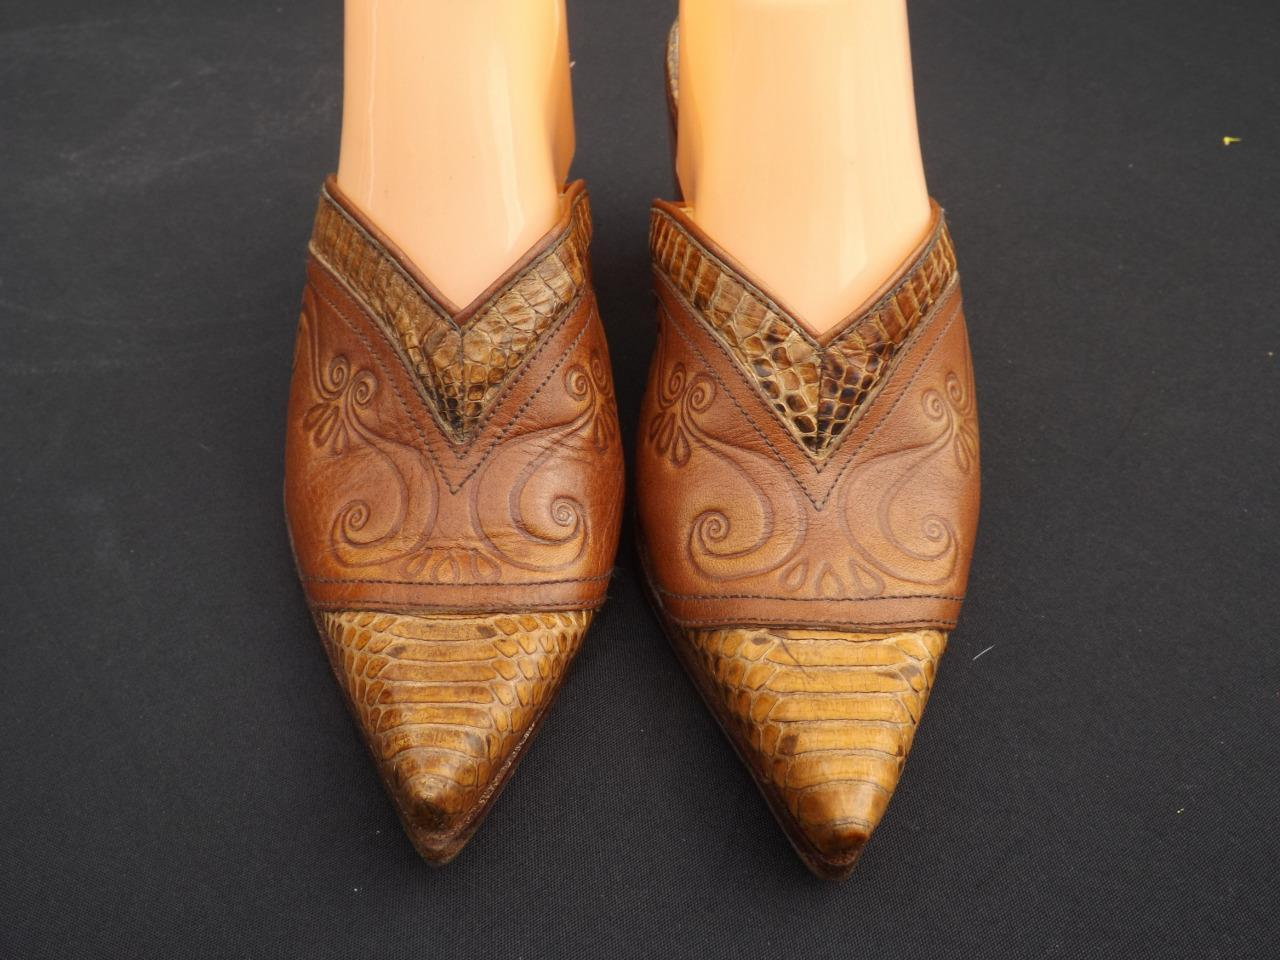 molto popolare Salpy Montana Western Snake Snake Snake Trim Marrone scarpe Mules Clogs Slides Sz 8 Pointed Toe  di moda